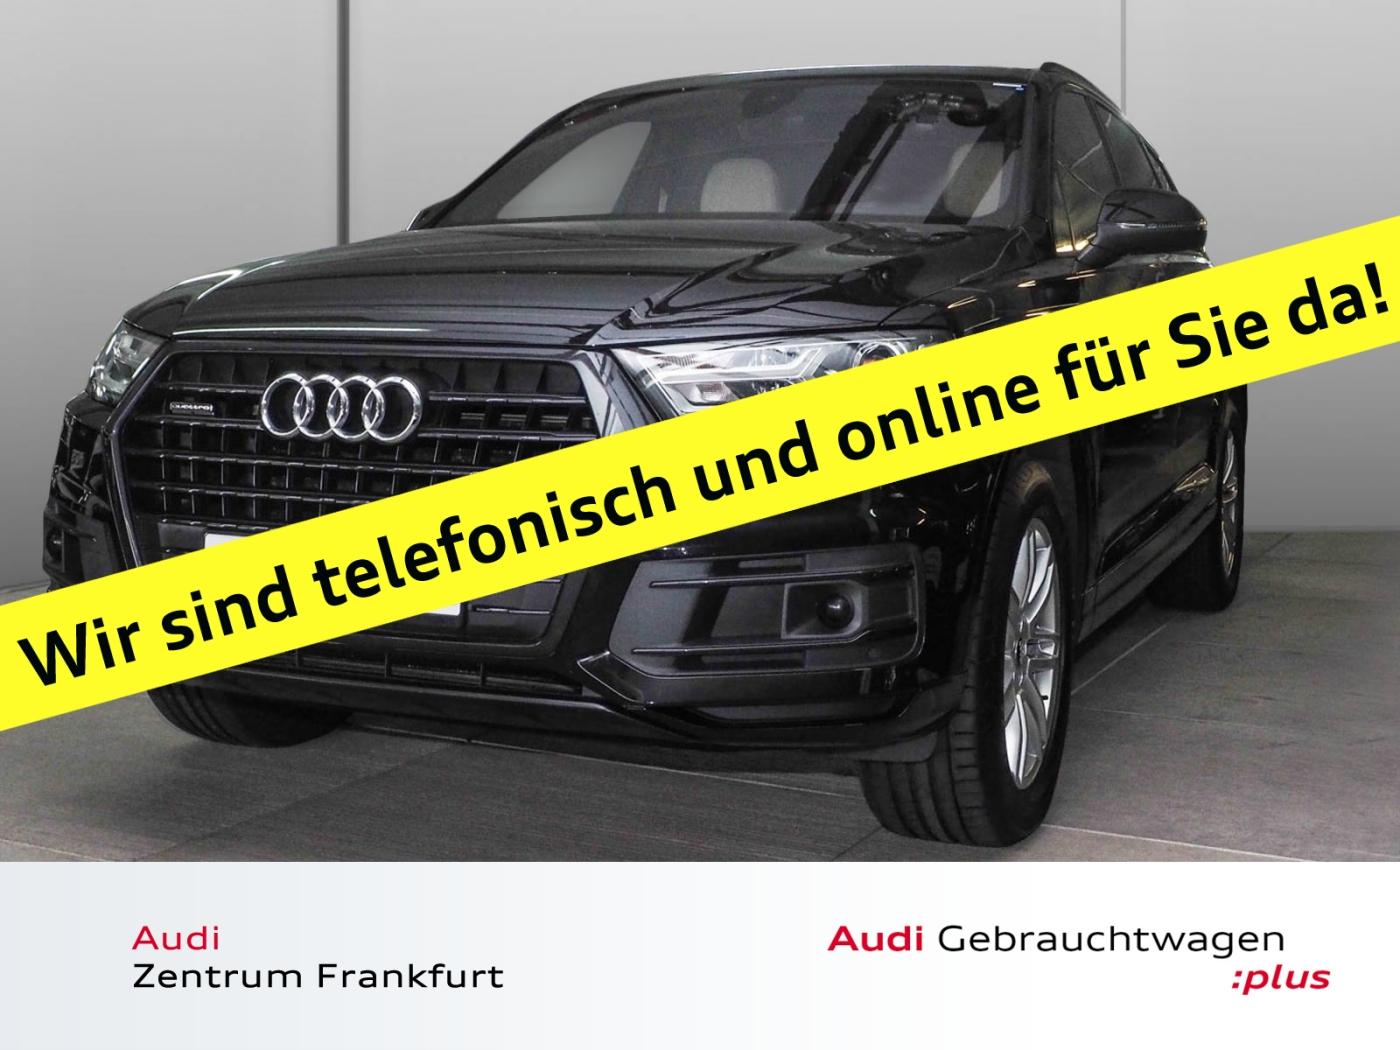 Audi Q7 3.0 TDI quattro tiptronic Navi Xenon DAB HuD, Jahr 2016, Diesel